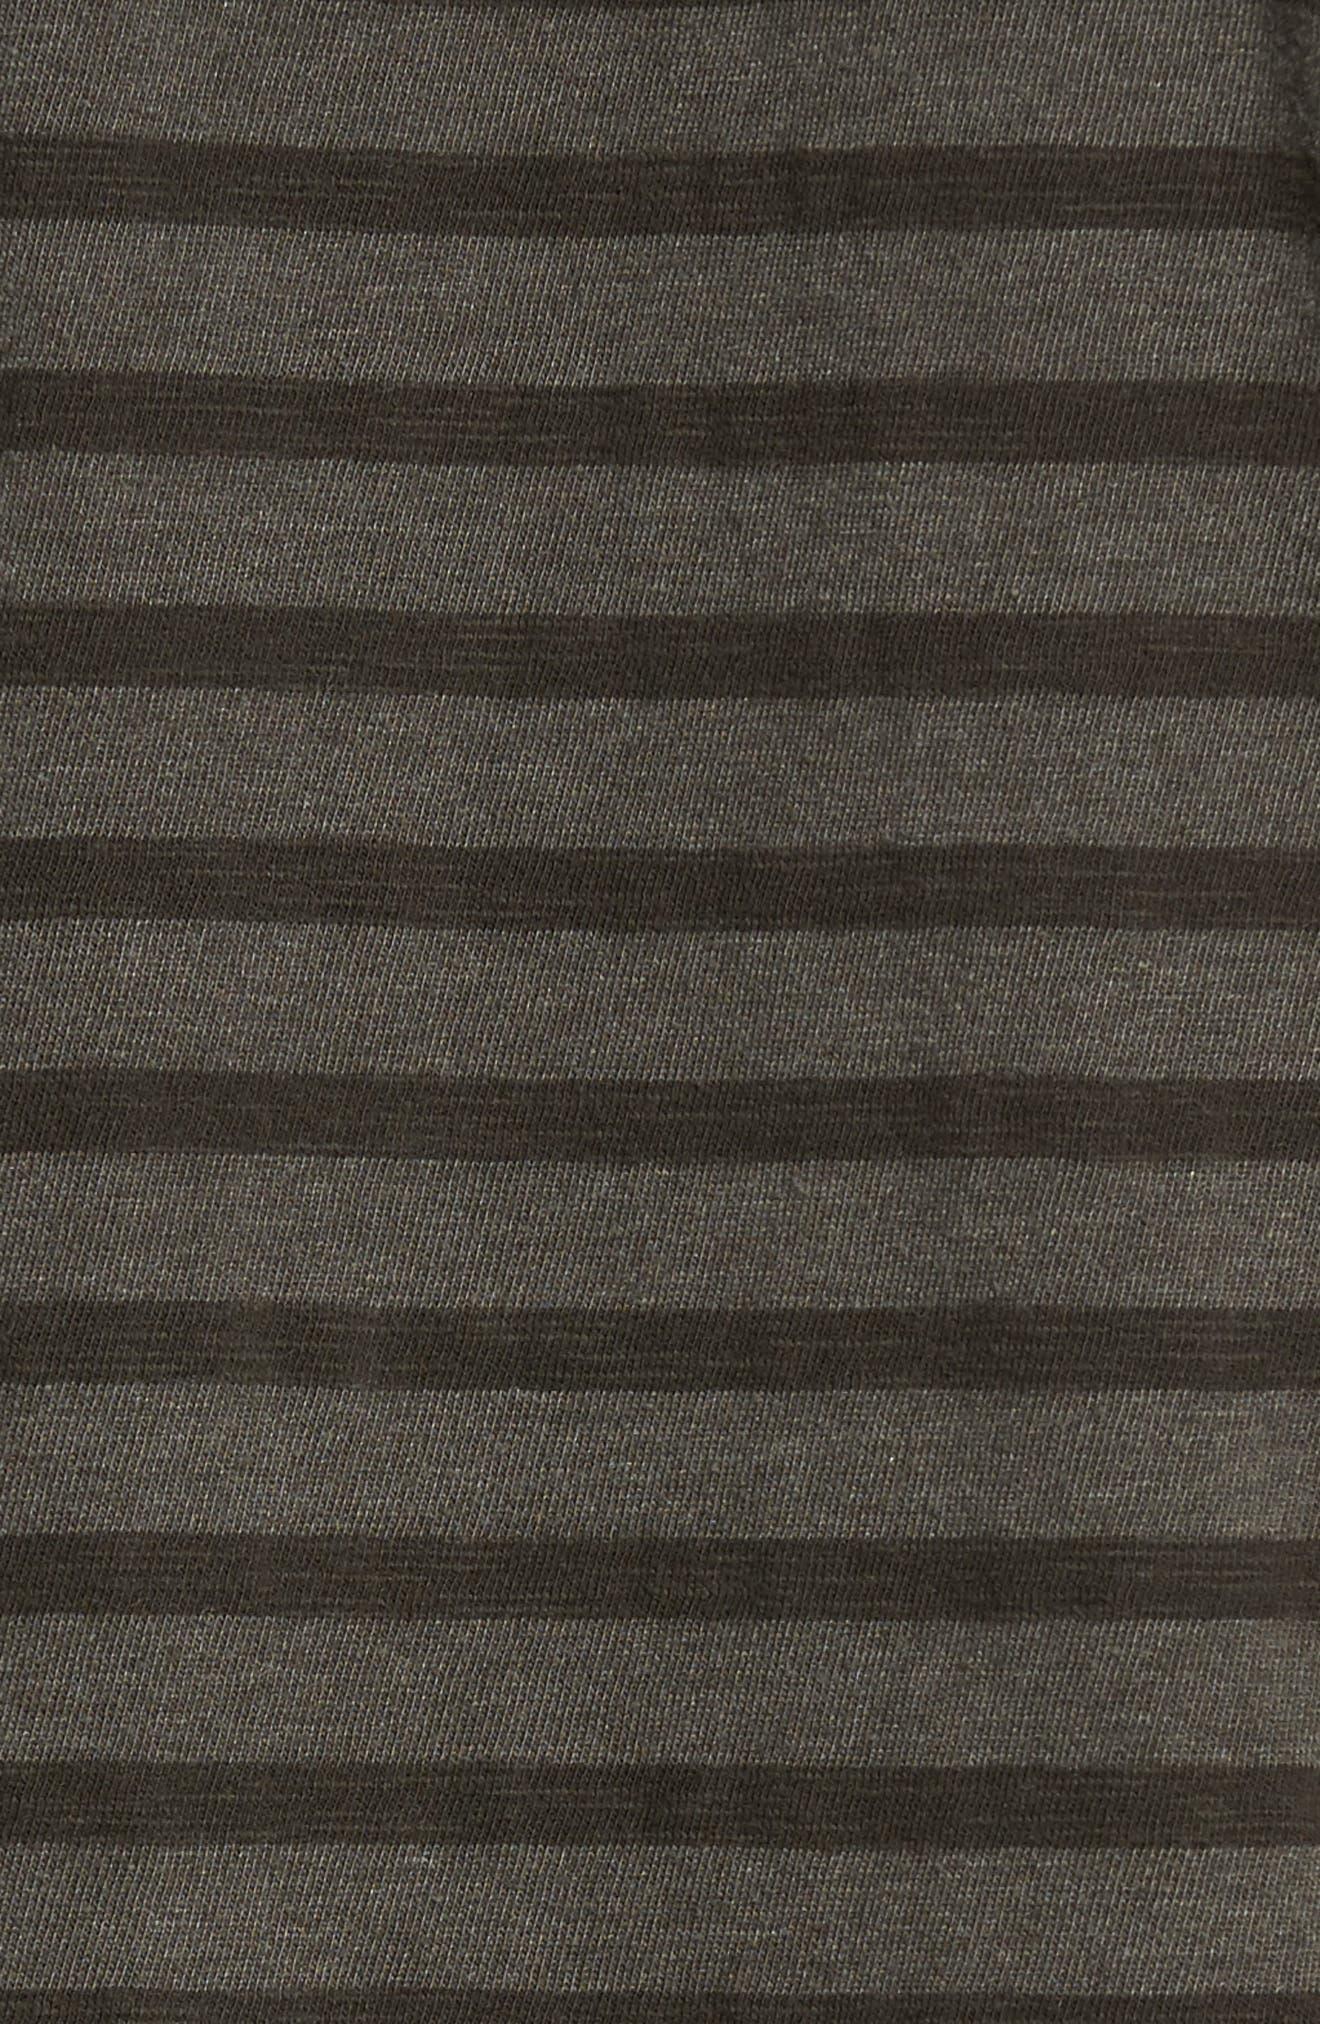 Stripe Hoodie,                             Alternate thumbnail 5, color,                             Olive